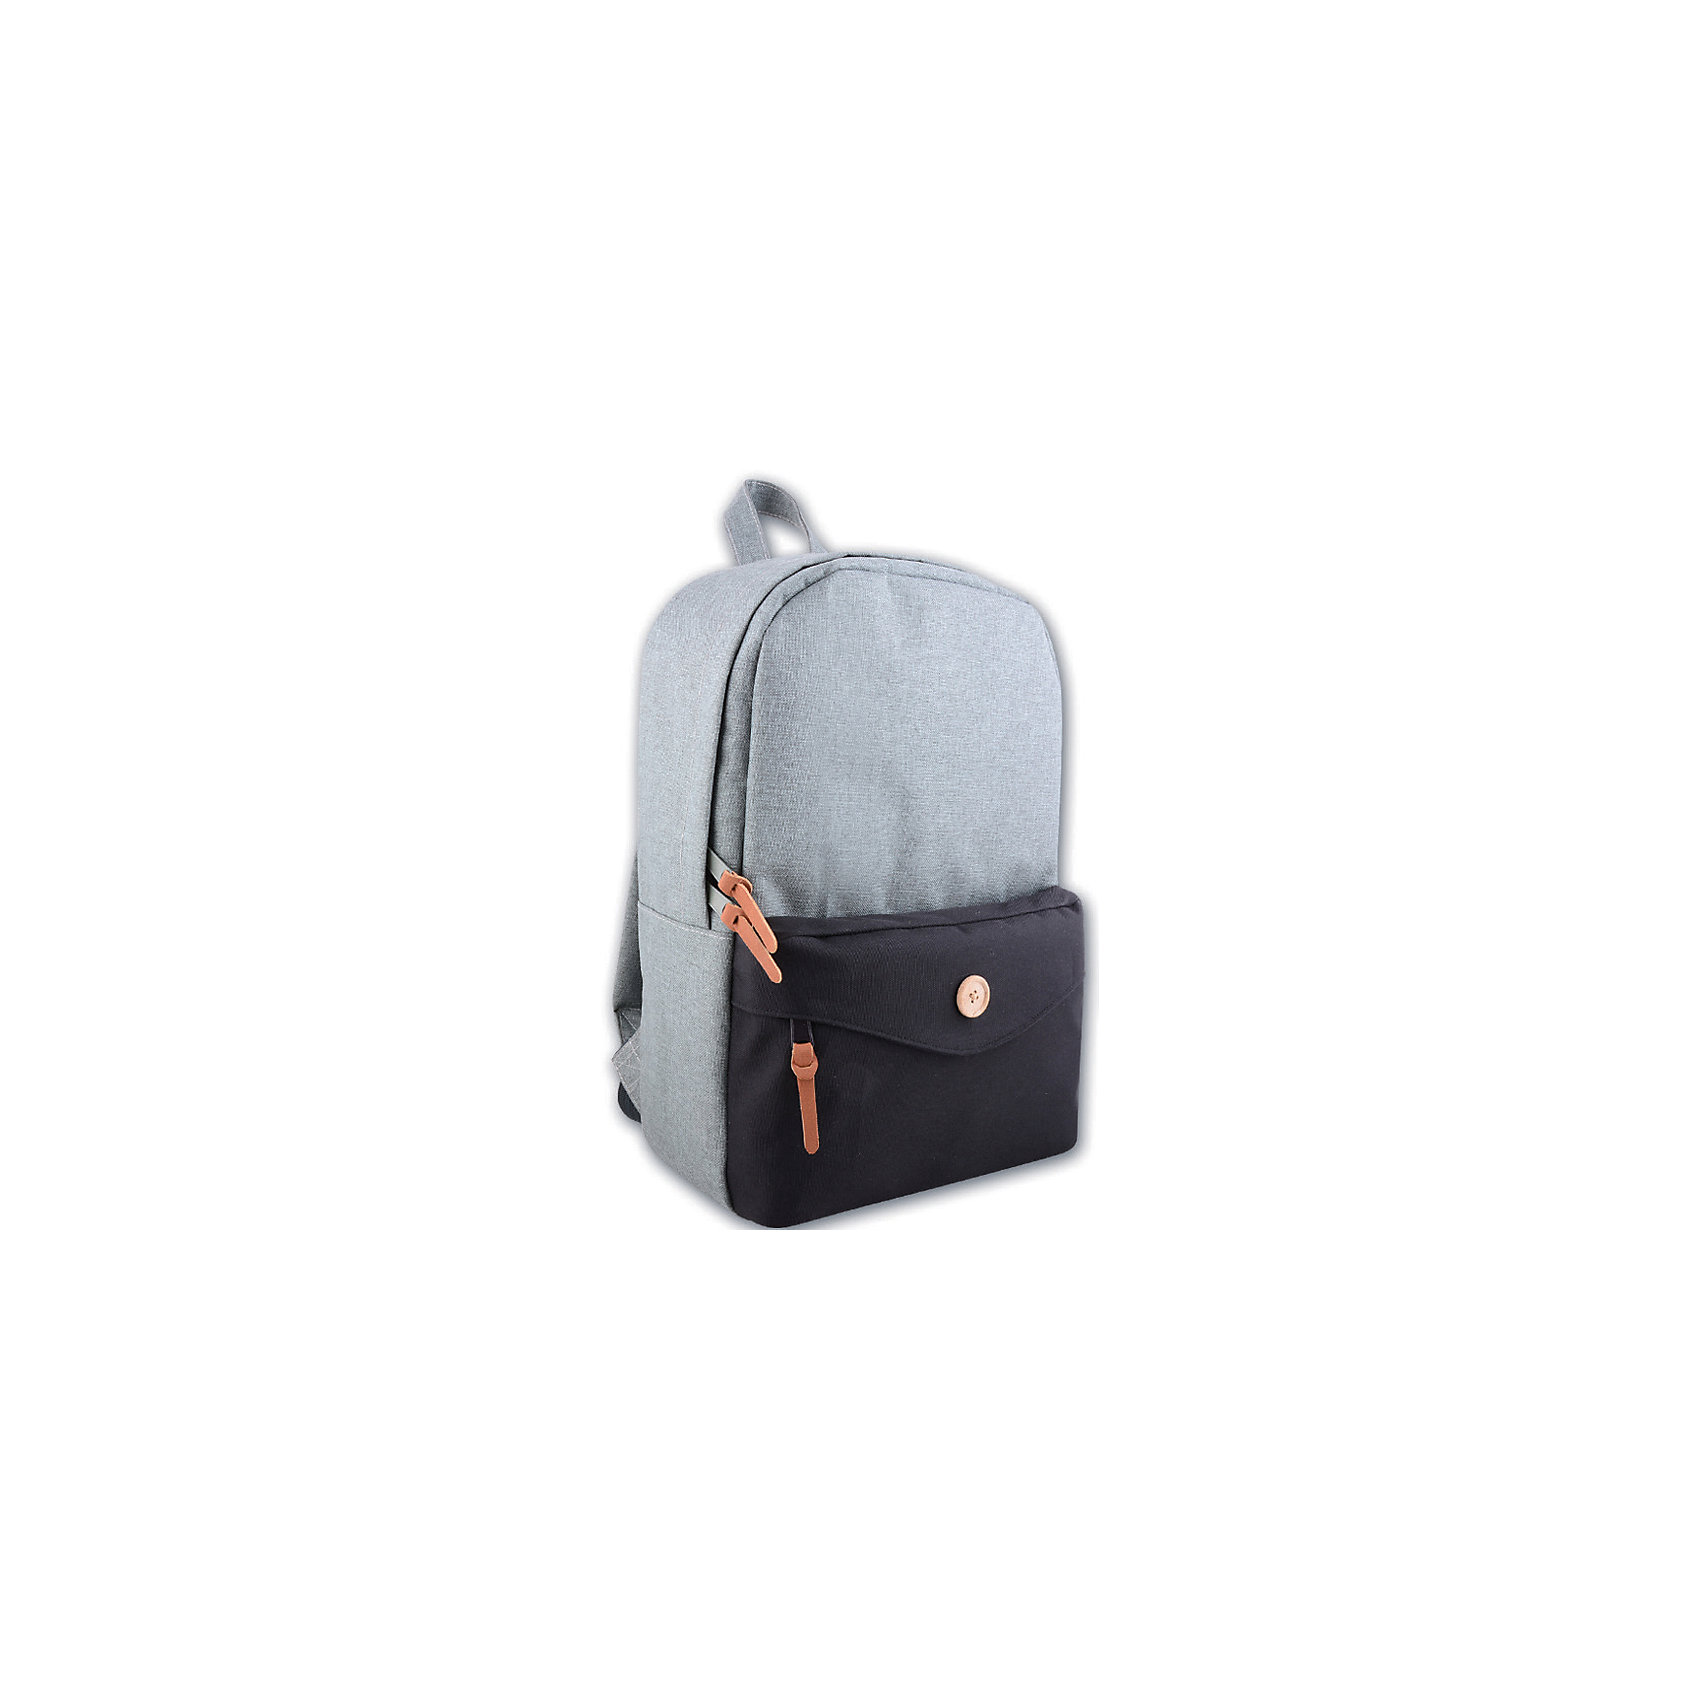 Рюкзак молодежный, серый